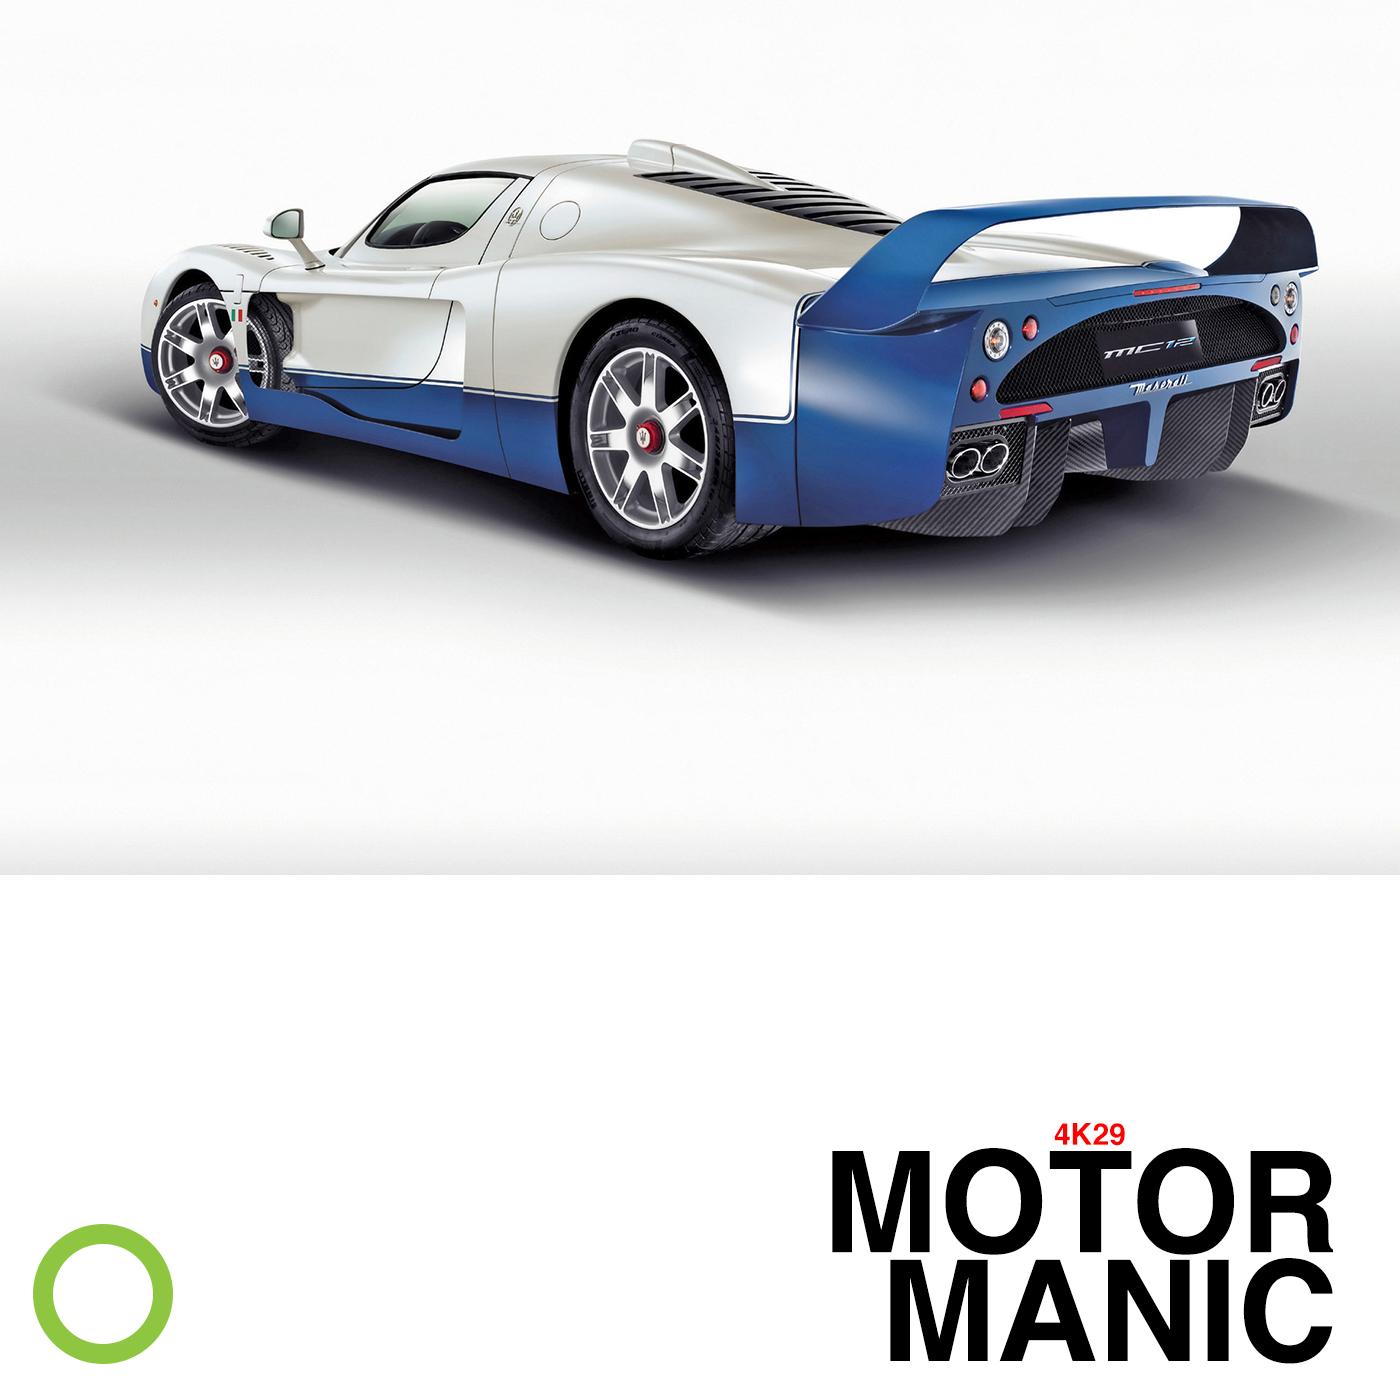 MOTOR MANIC 4K29